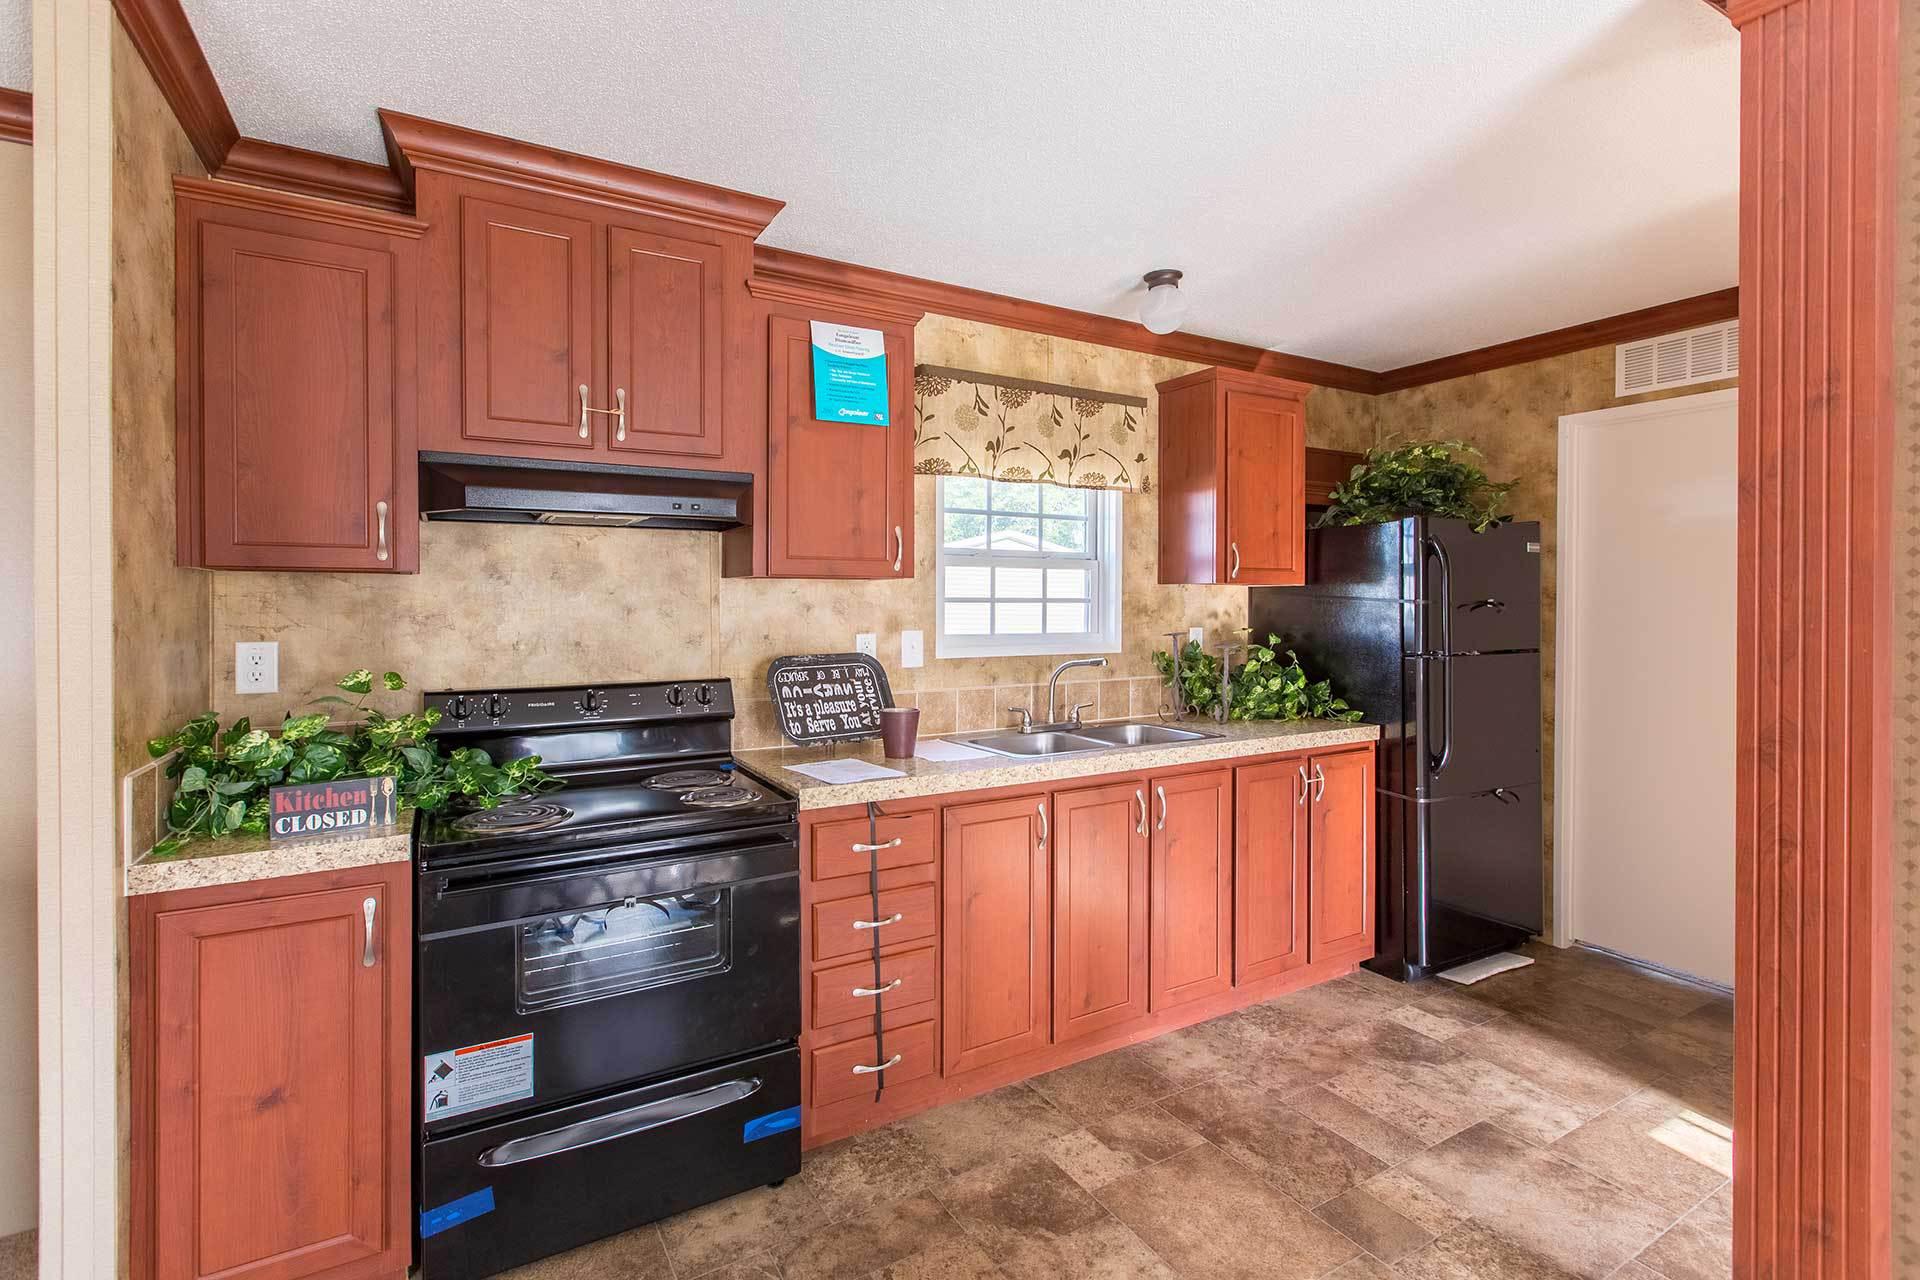 modular home kitchen - Gulf Breeze, FL